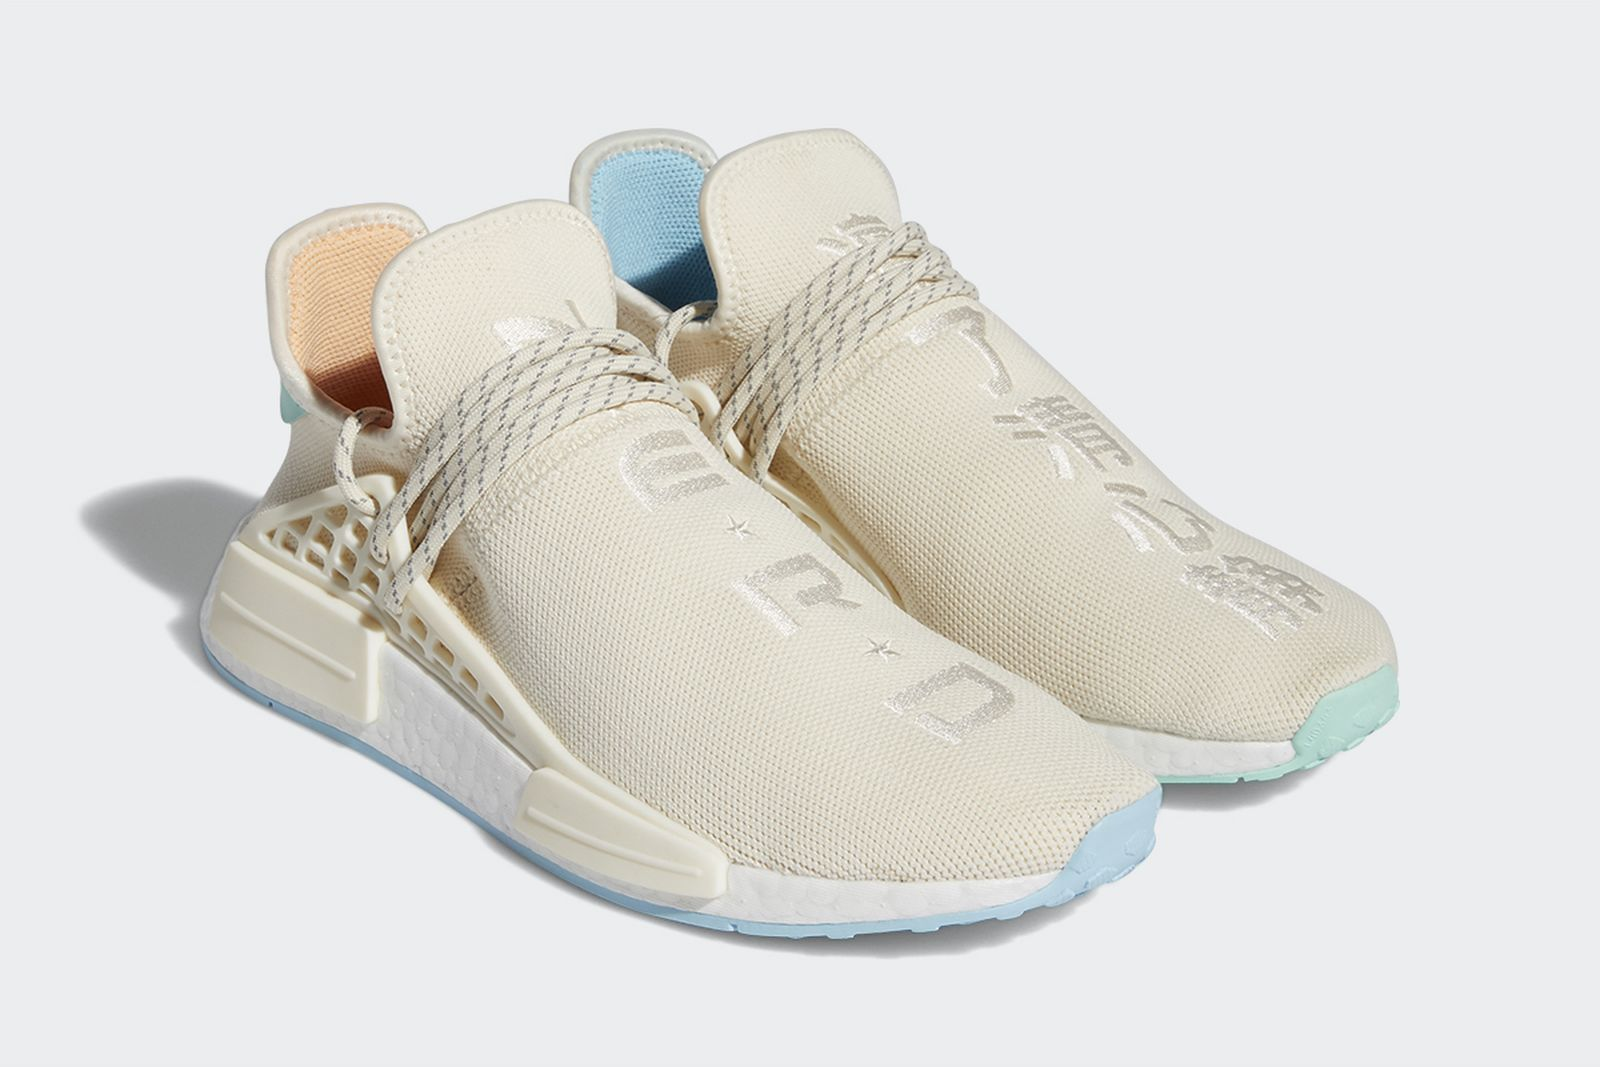 nerd-adidas-nmd-hu-release-date-price-1-04